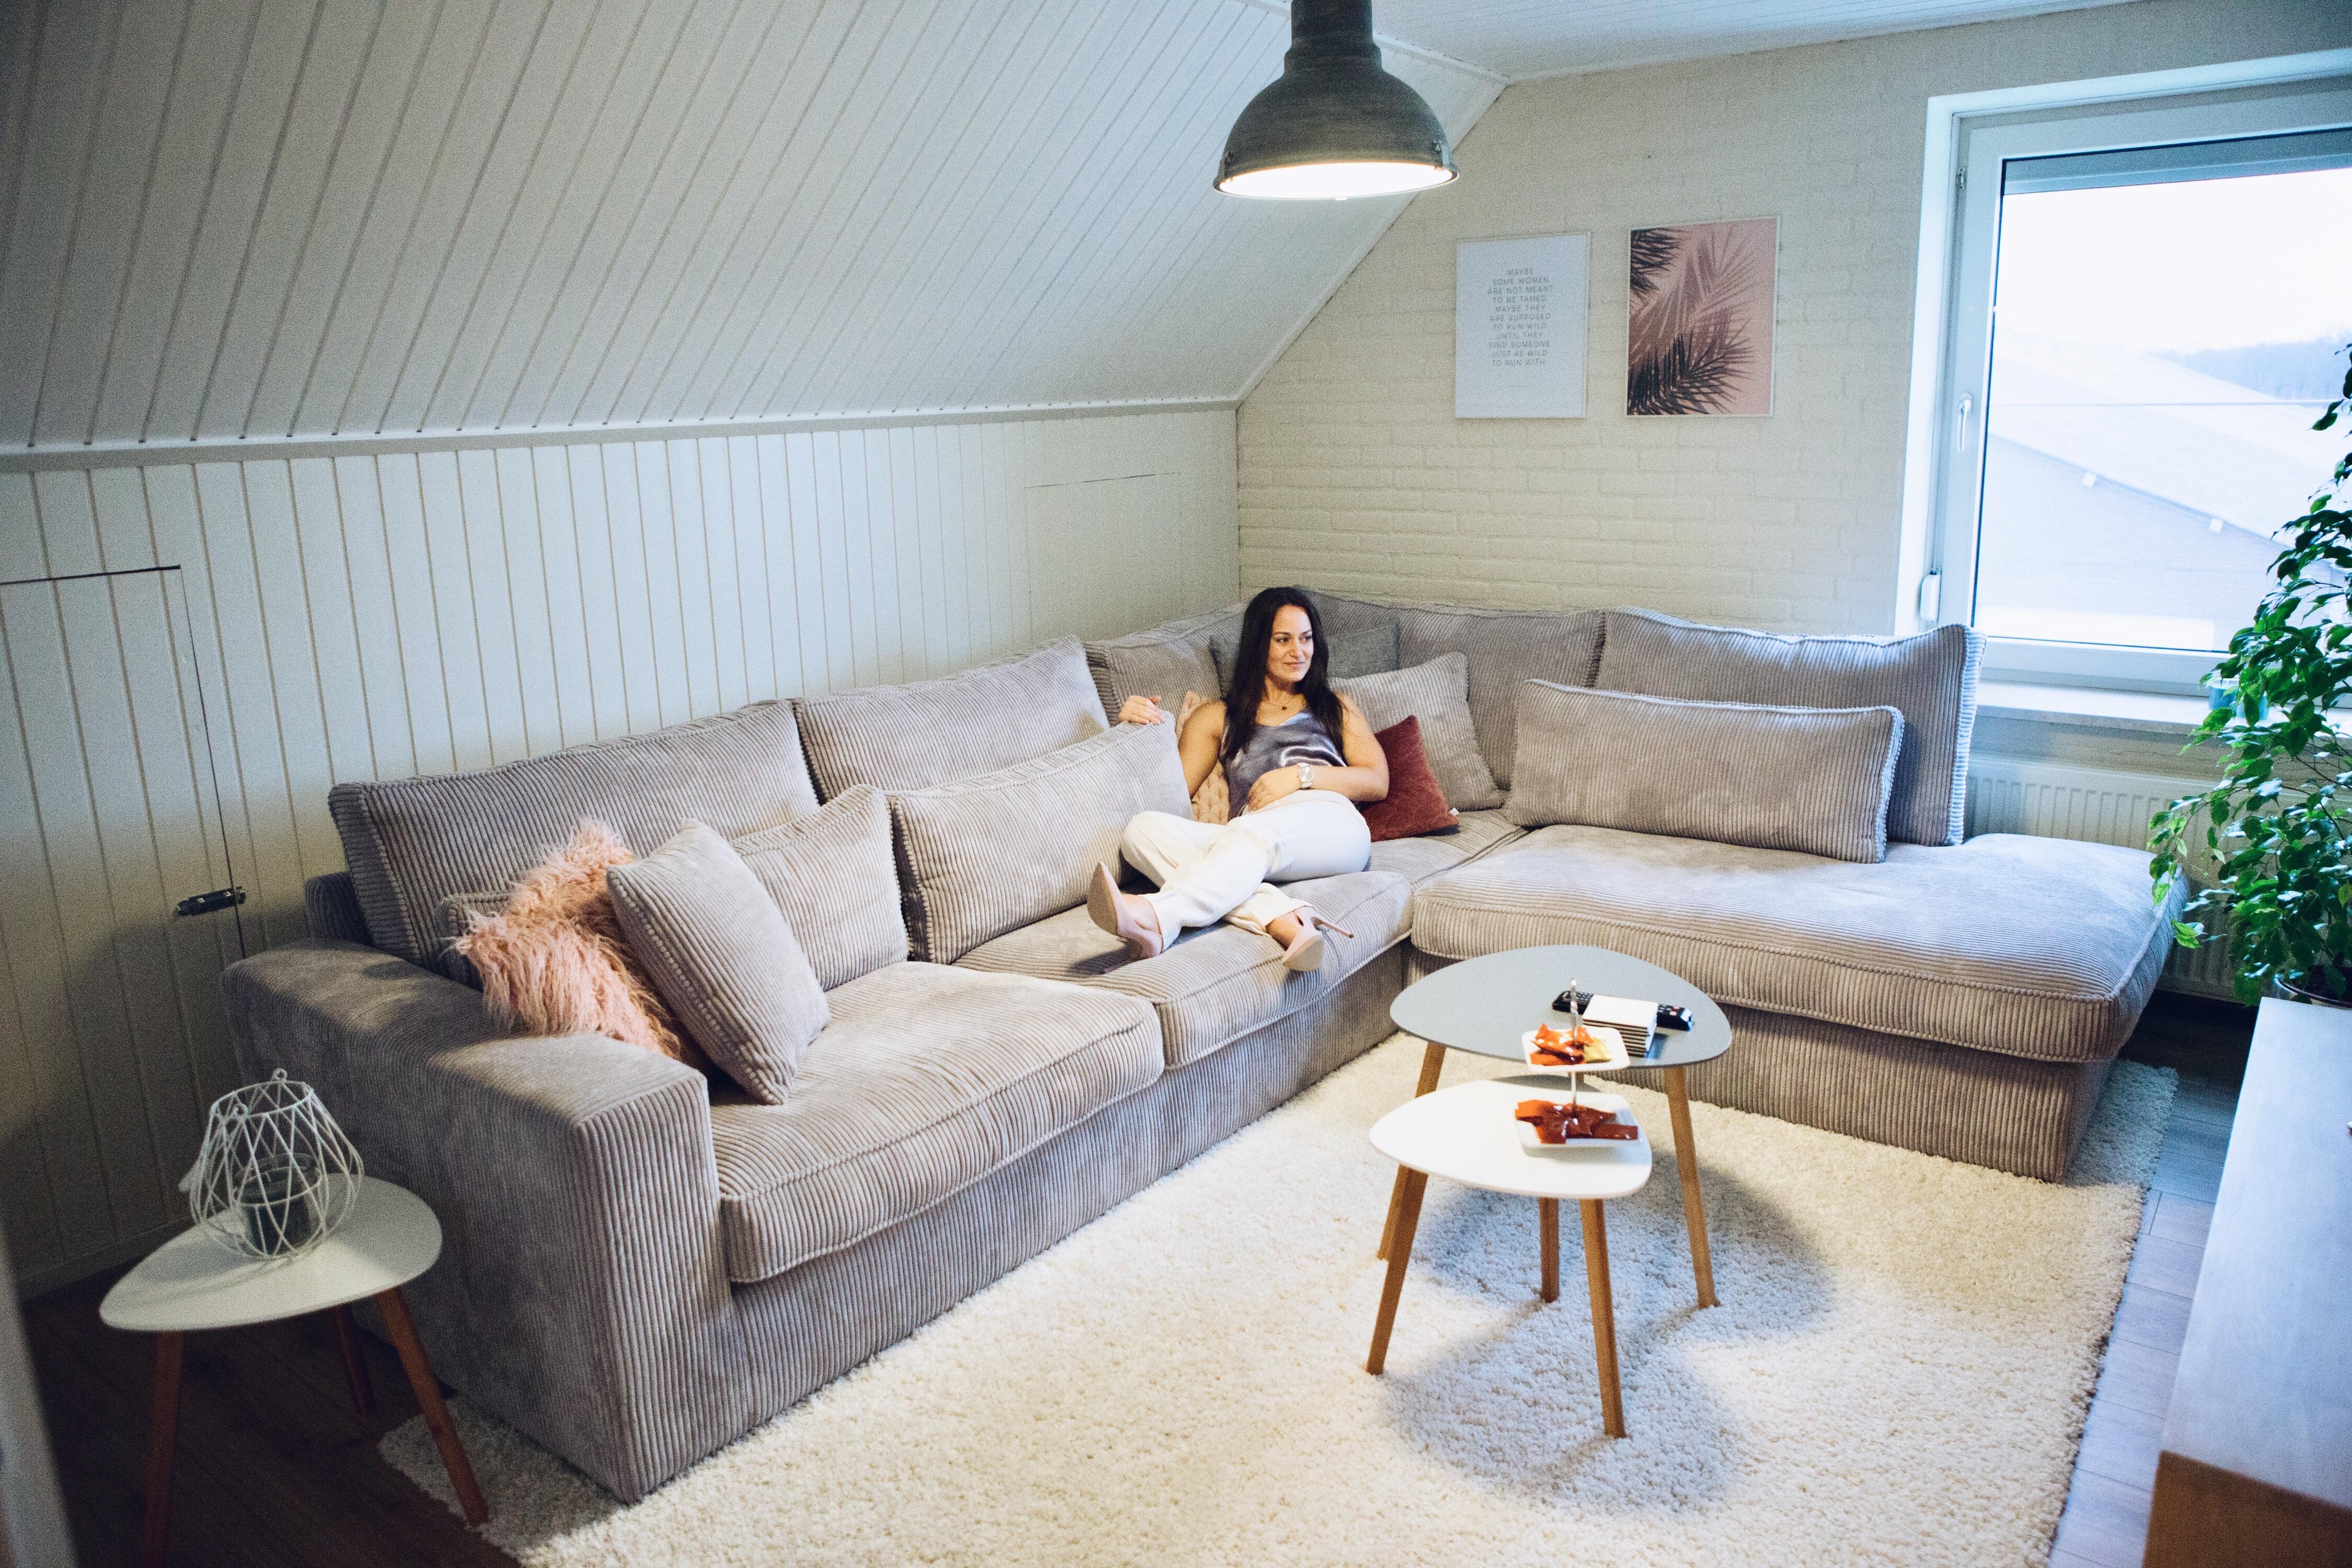 Posters In Slaapkamer : Grote posters slaapkamer beige slaapkamer met een grote